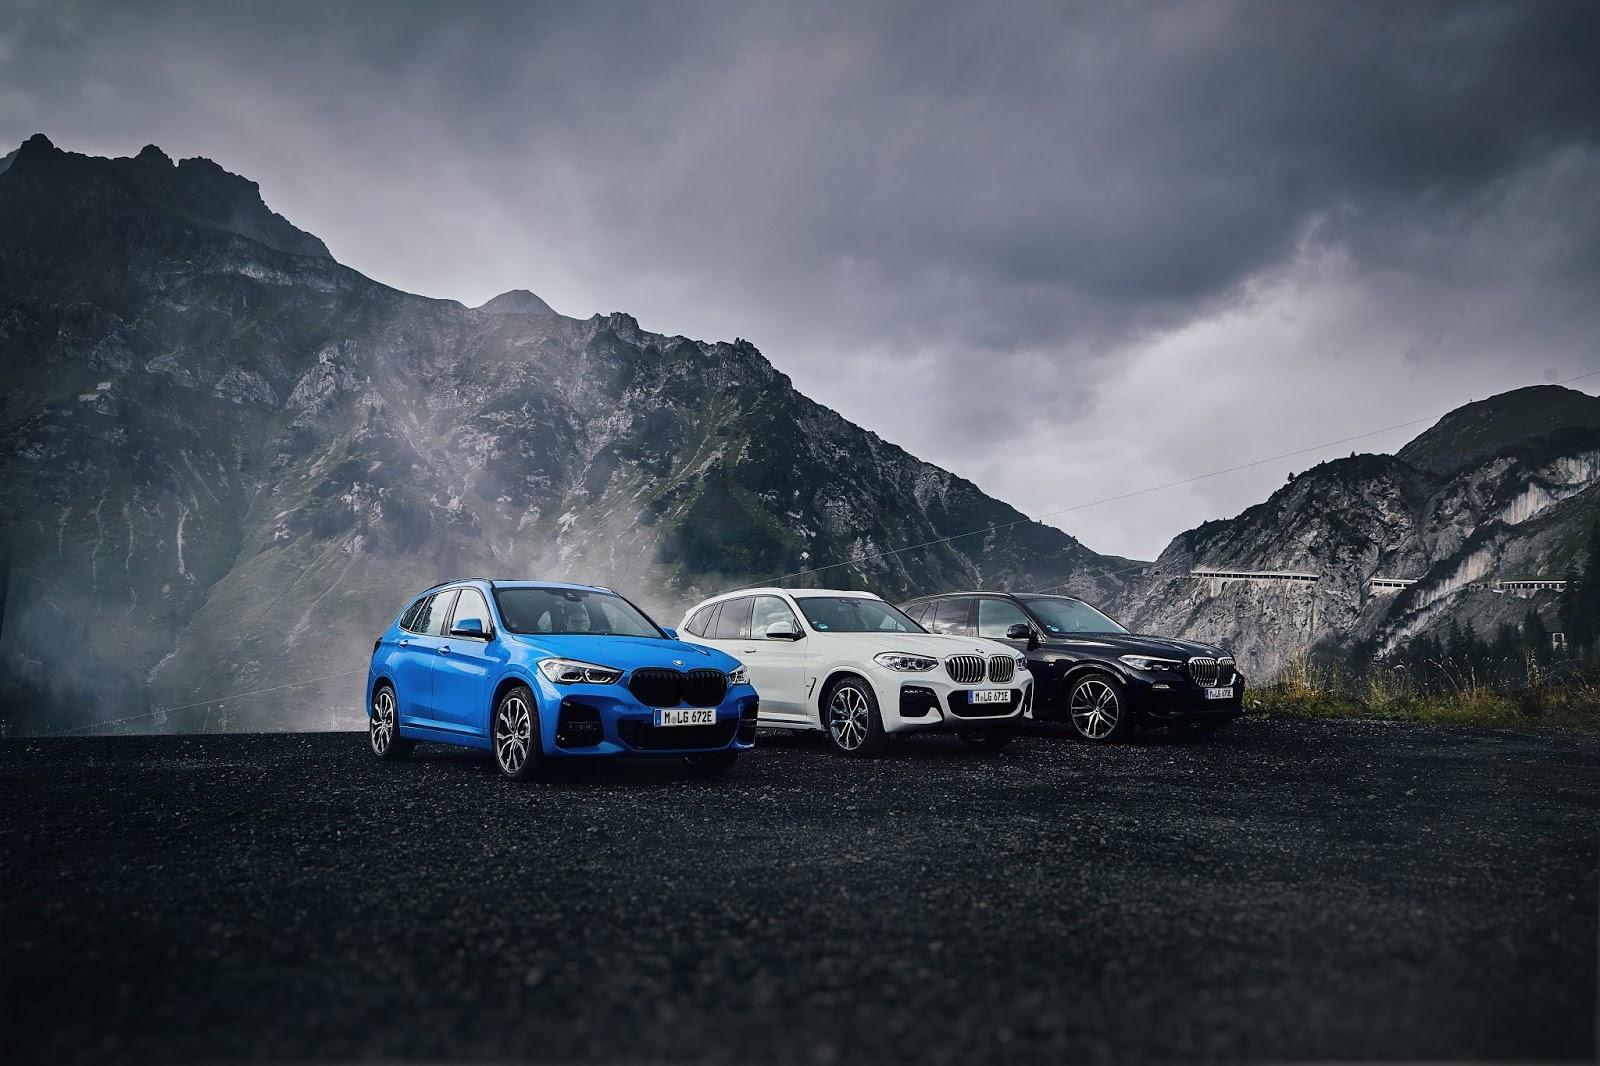 P90365485 highRes Η BMW X1 xDrive25e έχει μέση κατανάλωση 2 lt/100 km BMW, BMW X, BMW X1, Electric cars, Hybrid, zblog, επιδόσεις, καινούργιο, καινούρια, καινούριο, μοντέλα, υβριδικό